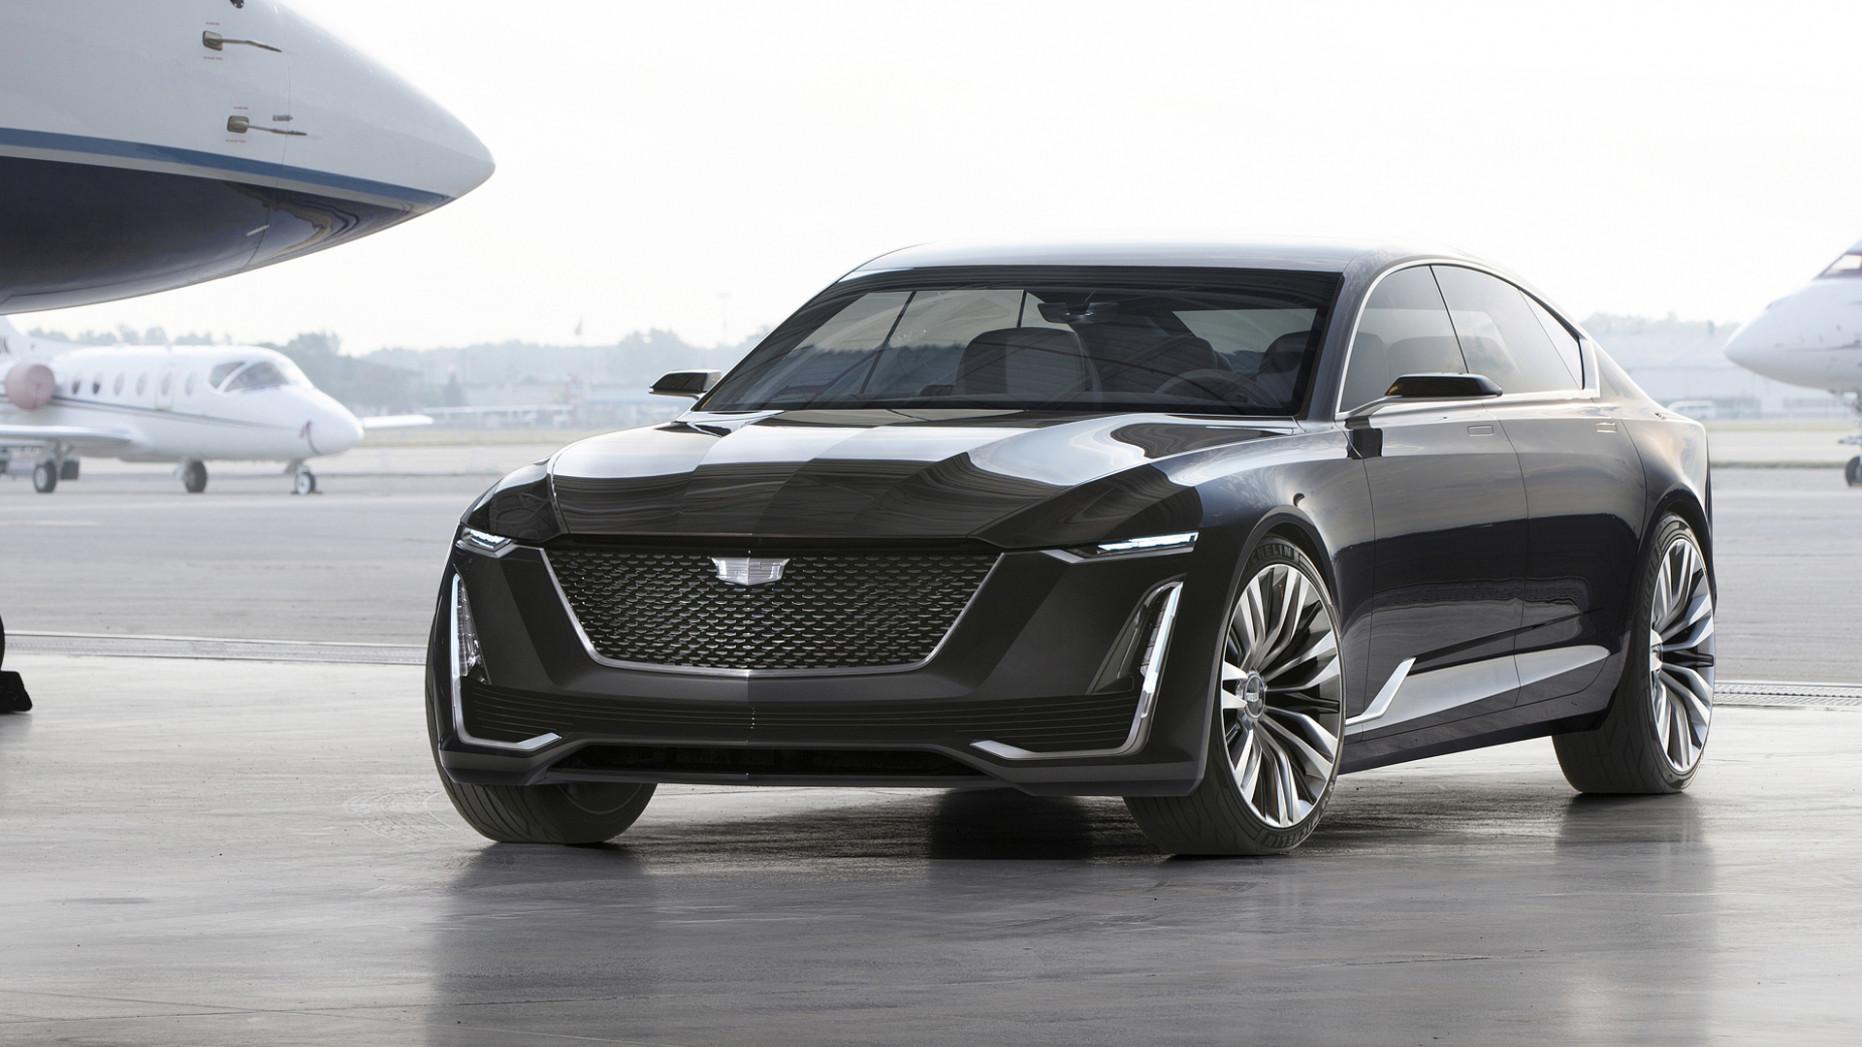 Engine 2022 Cadillac Cts V